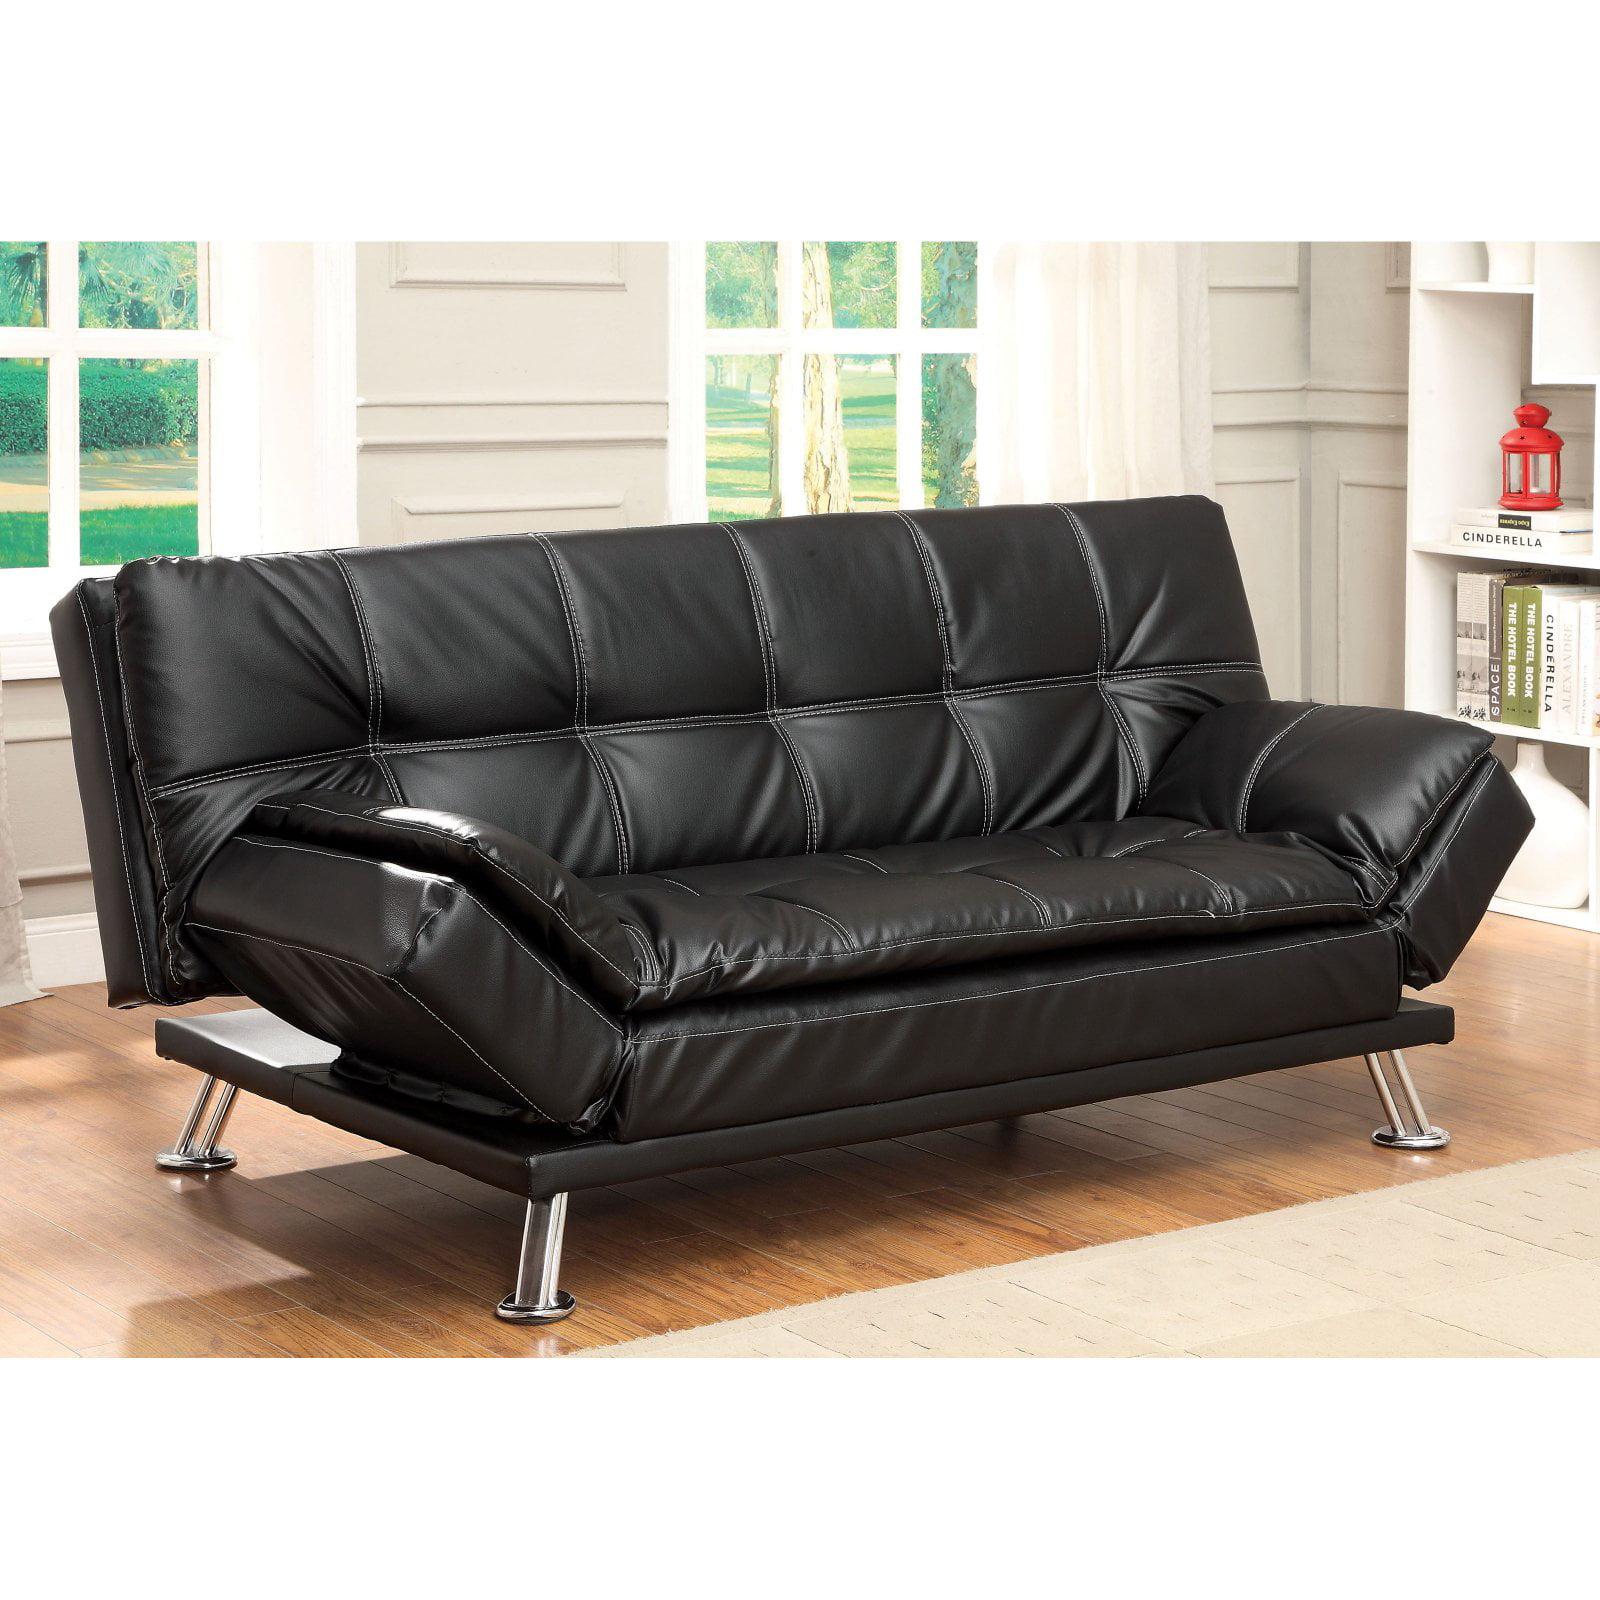 Furniture of America Benitz Convertible Futon Sofa   Black ...